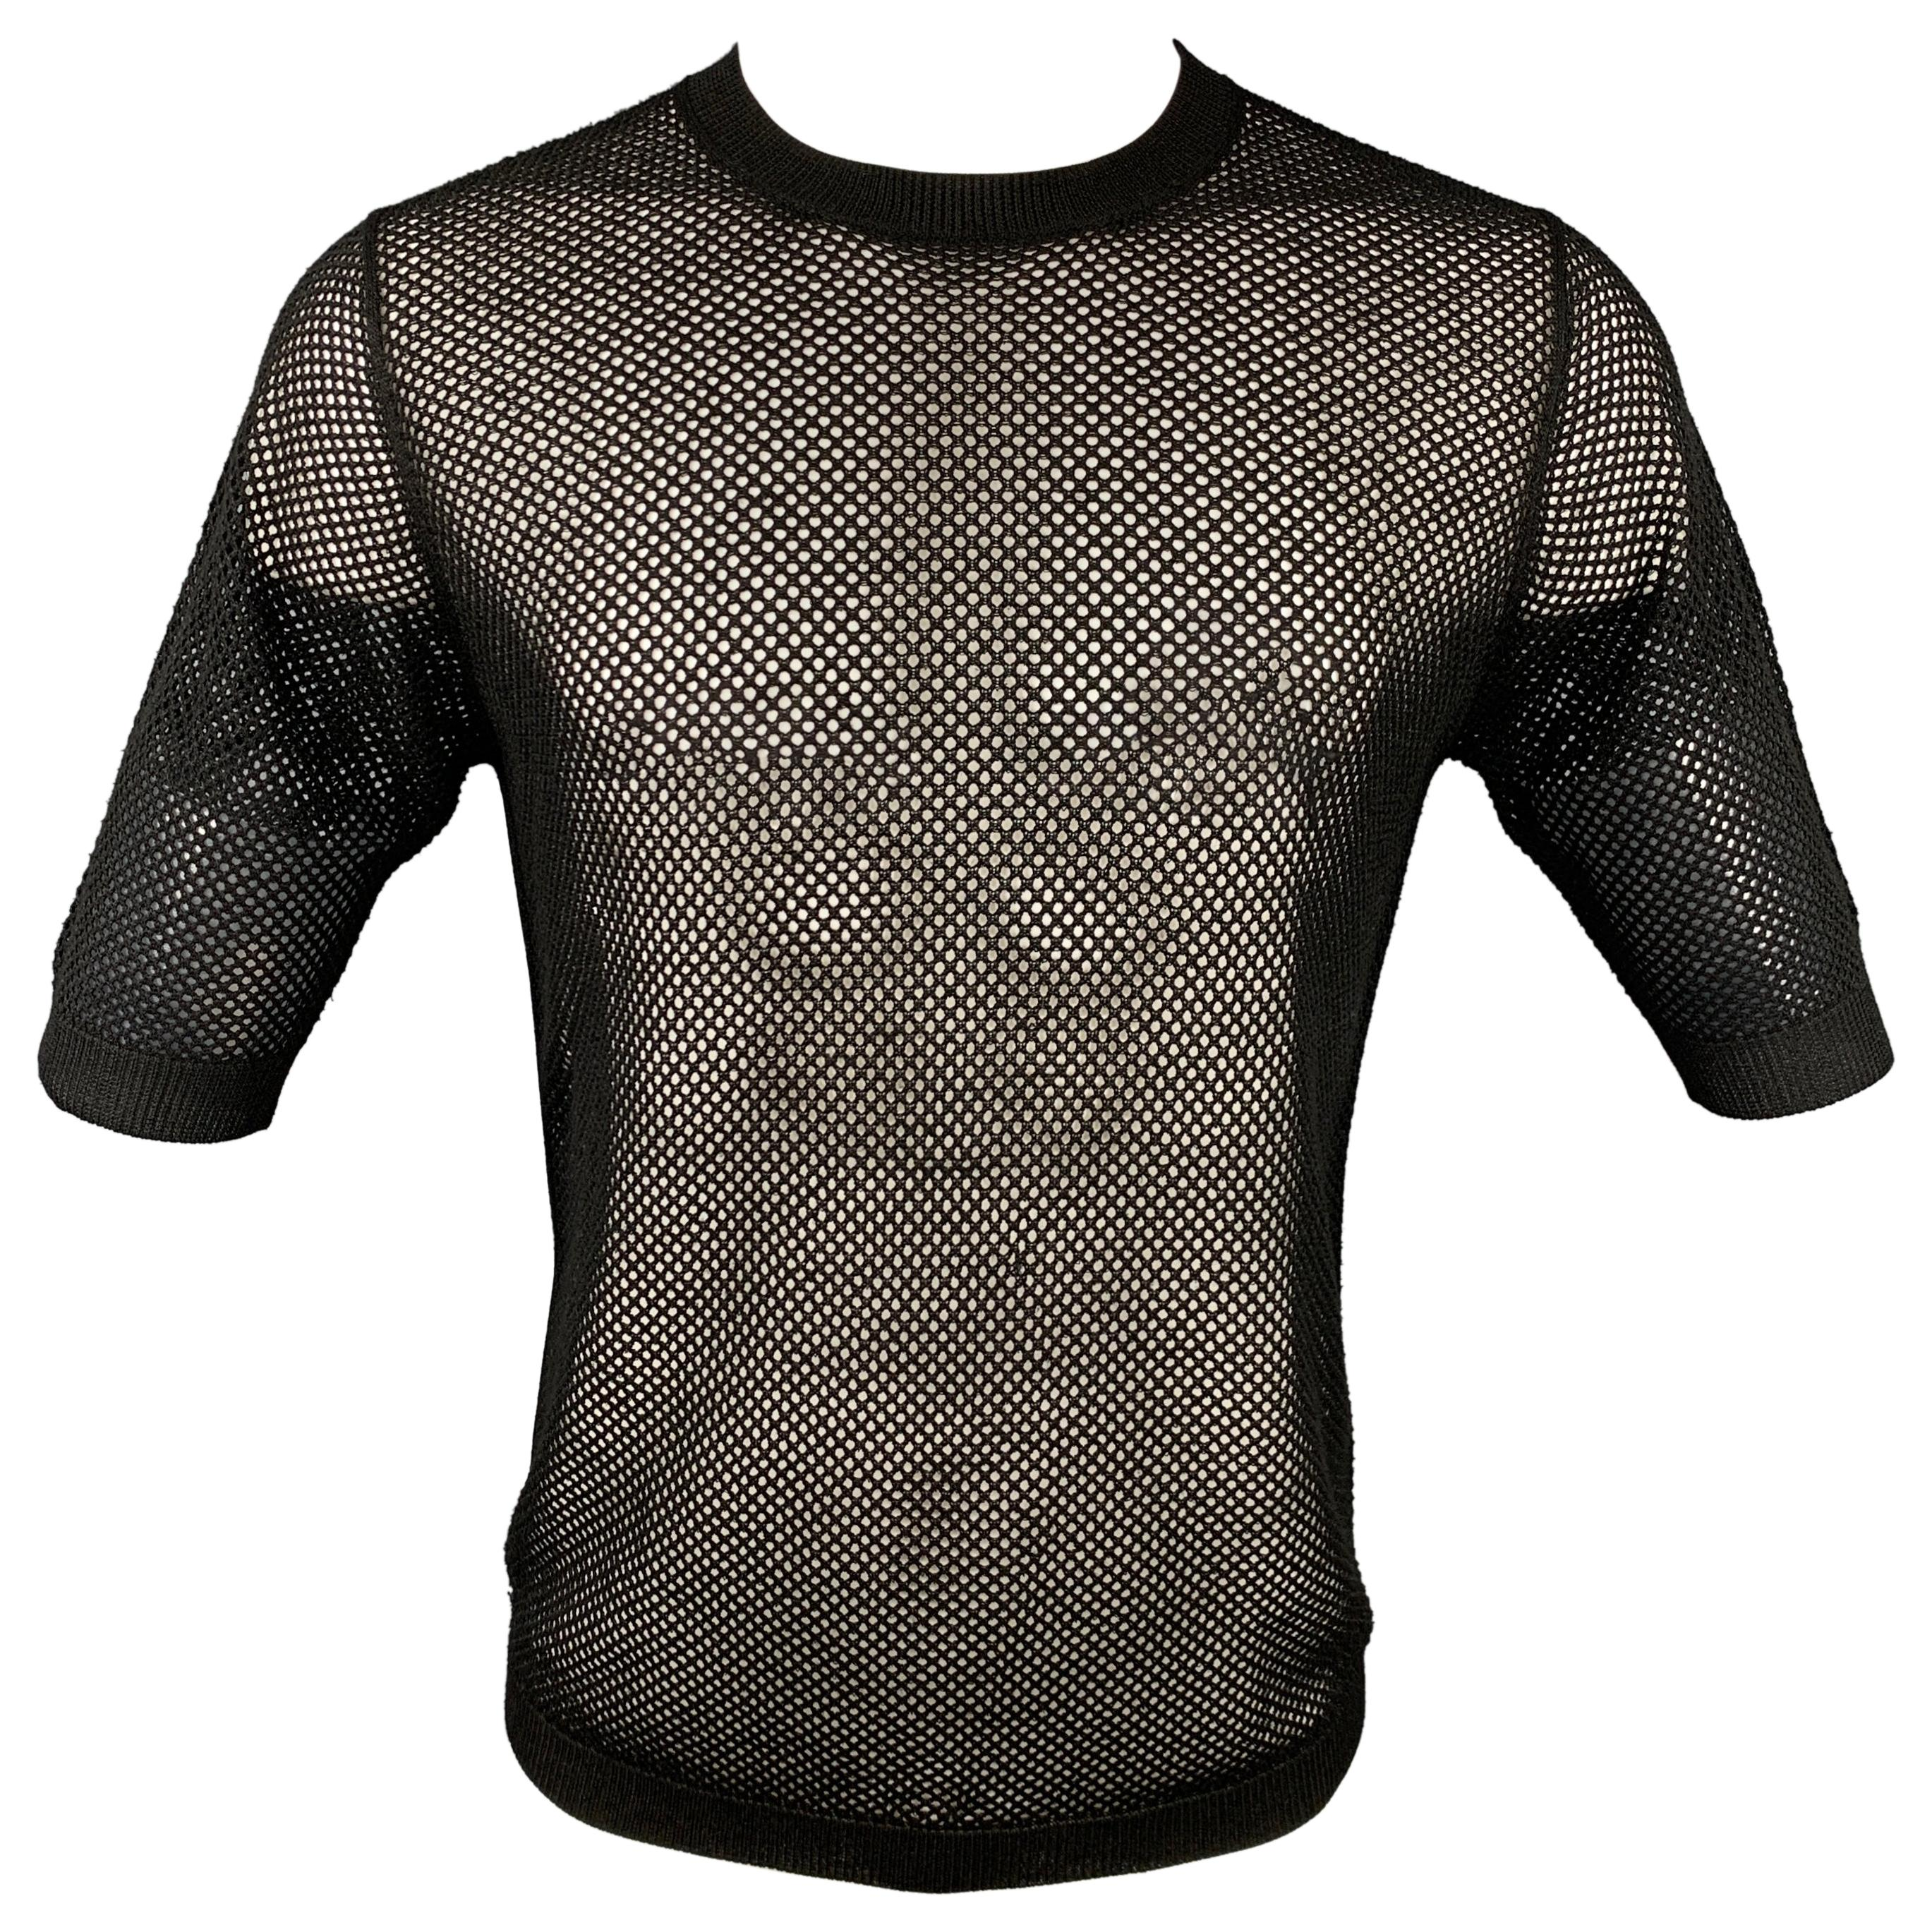 DRIES VAN NOTEN Size S Black Mesh Cotton Crew-Neck T-shirt